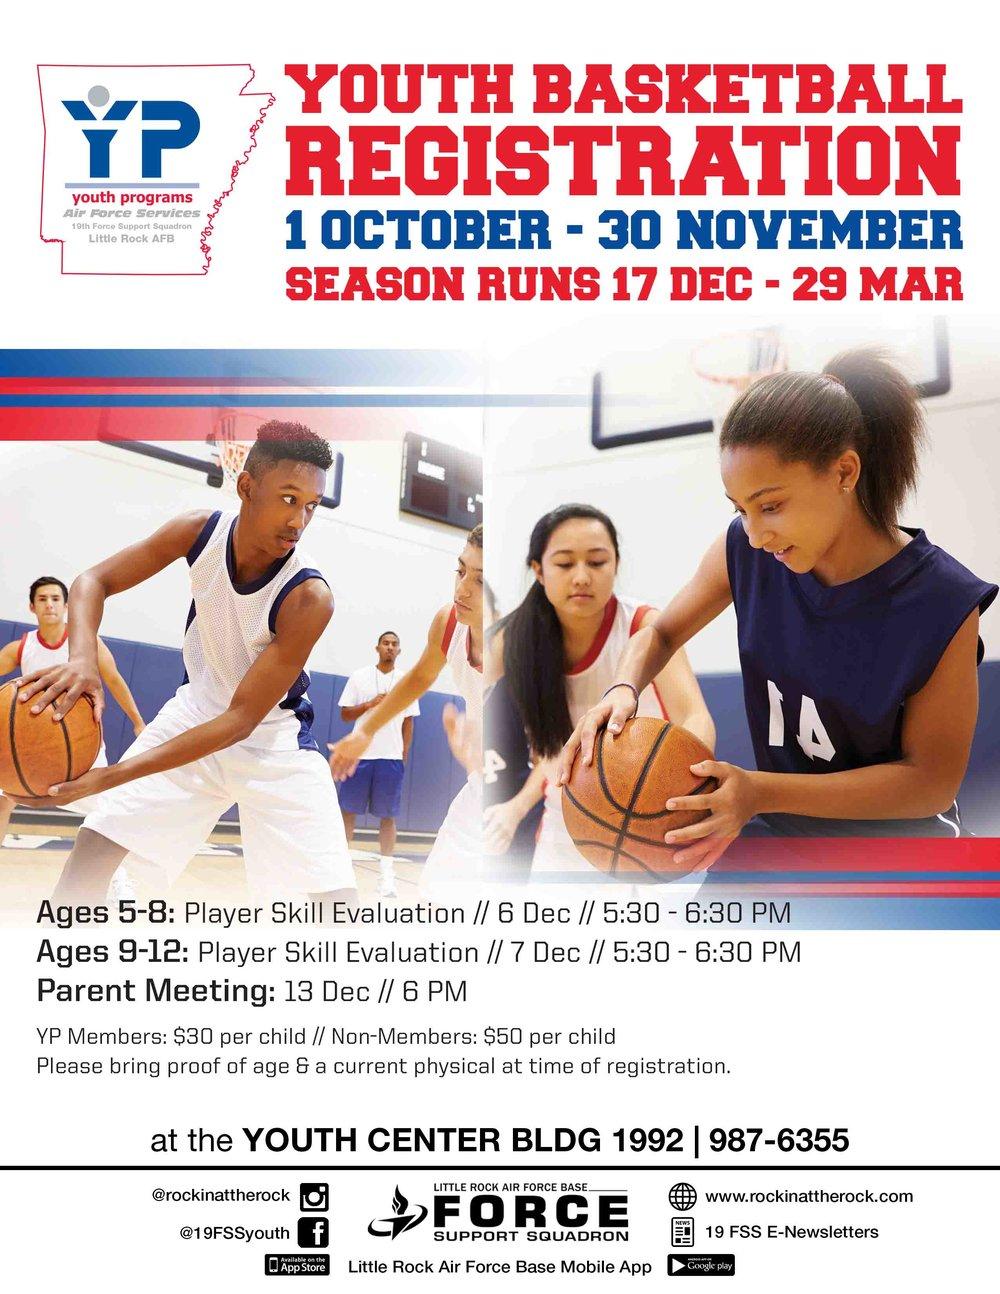 2018_10_YC_BasketballRegistration_Small.jpg